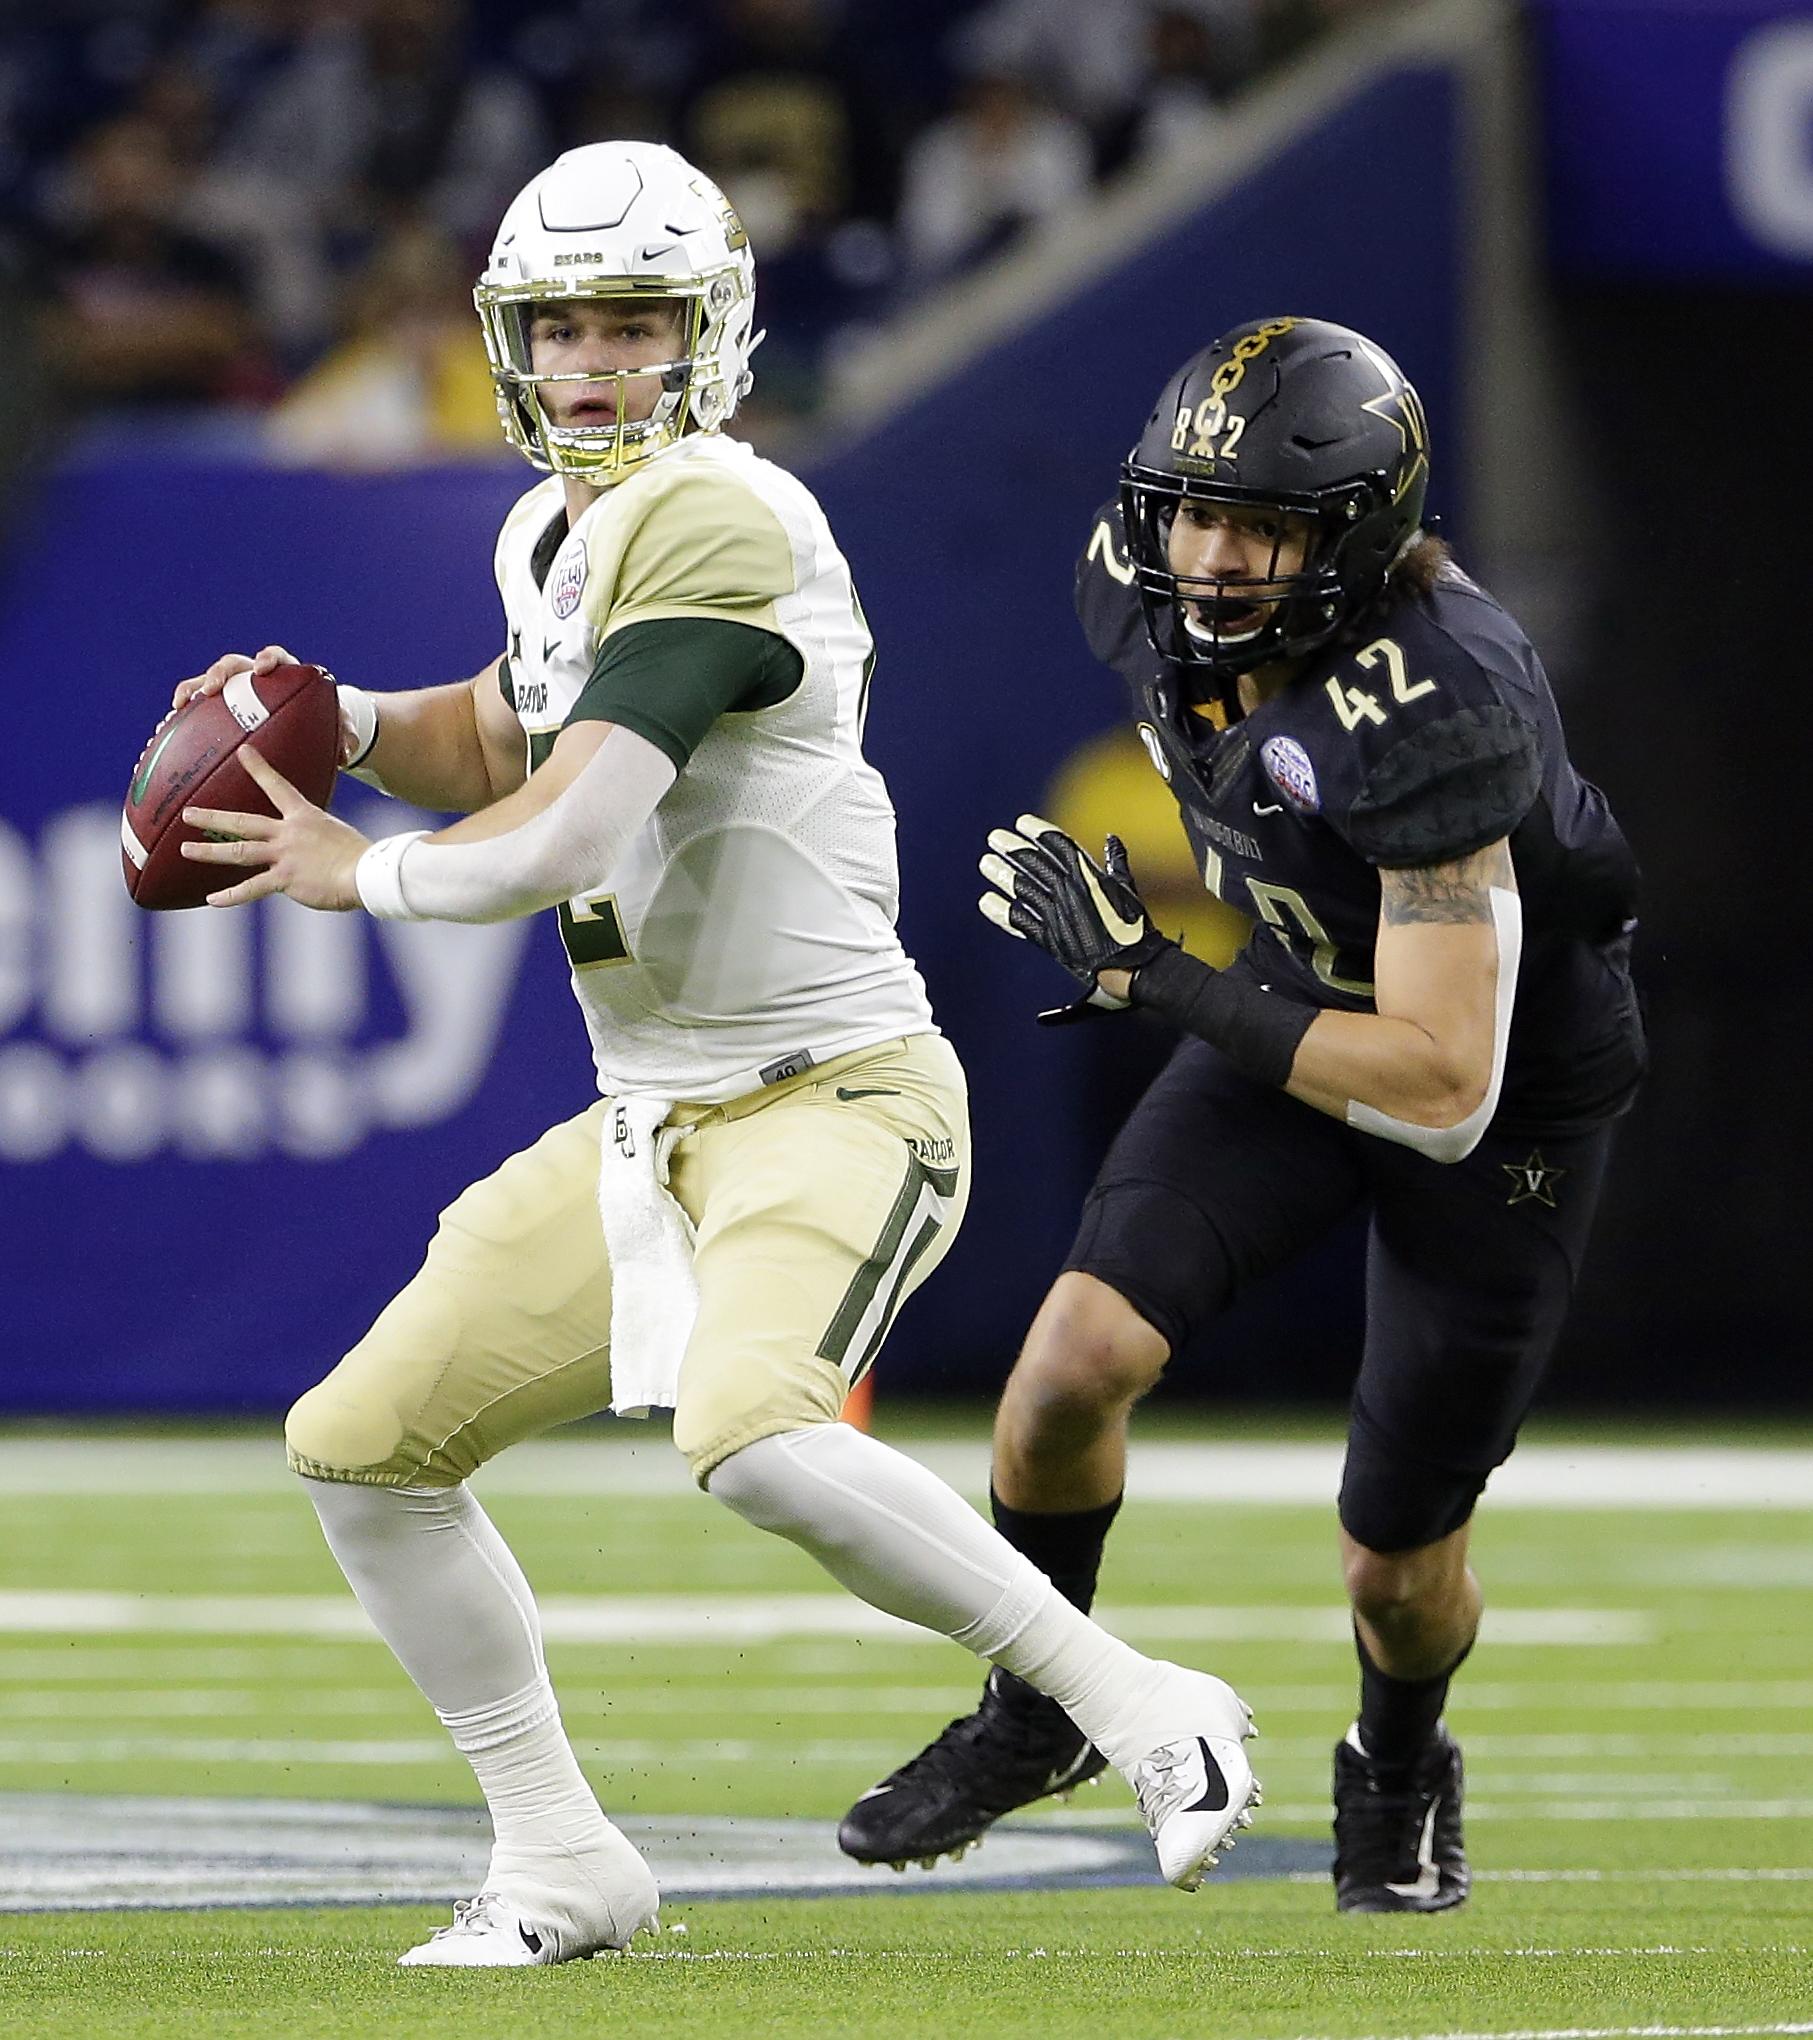 Brewer helps Baylor beat Vanderbilt 45-38 in Texas Bowl